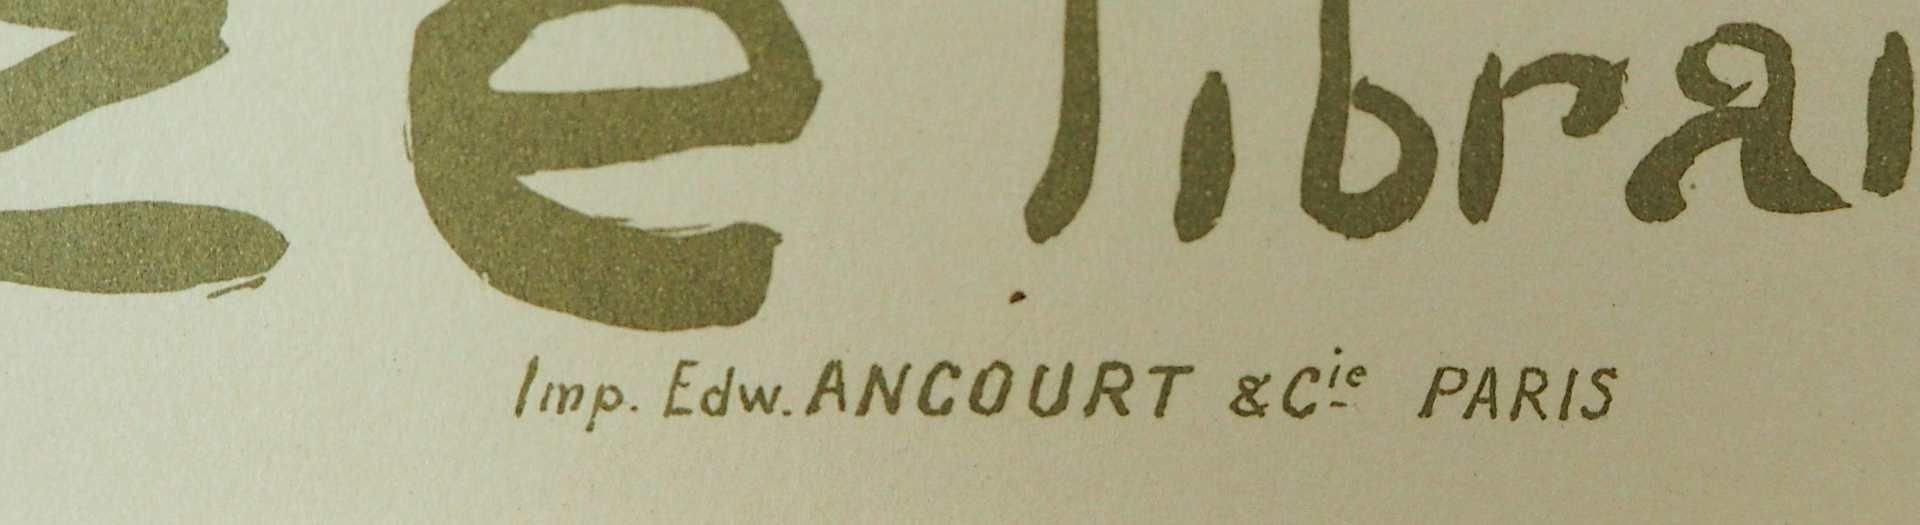 "1 Farblithographie ""Reine de Joie"" L. mittig sign./rücks. zugeschrieben TOULOUSE LAUTREC <b - Bild 3 aus 3"